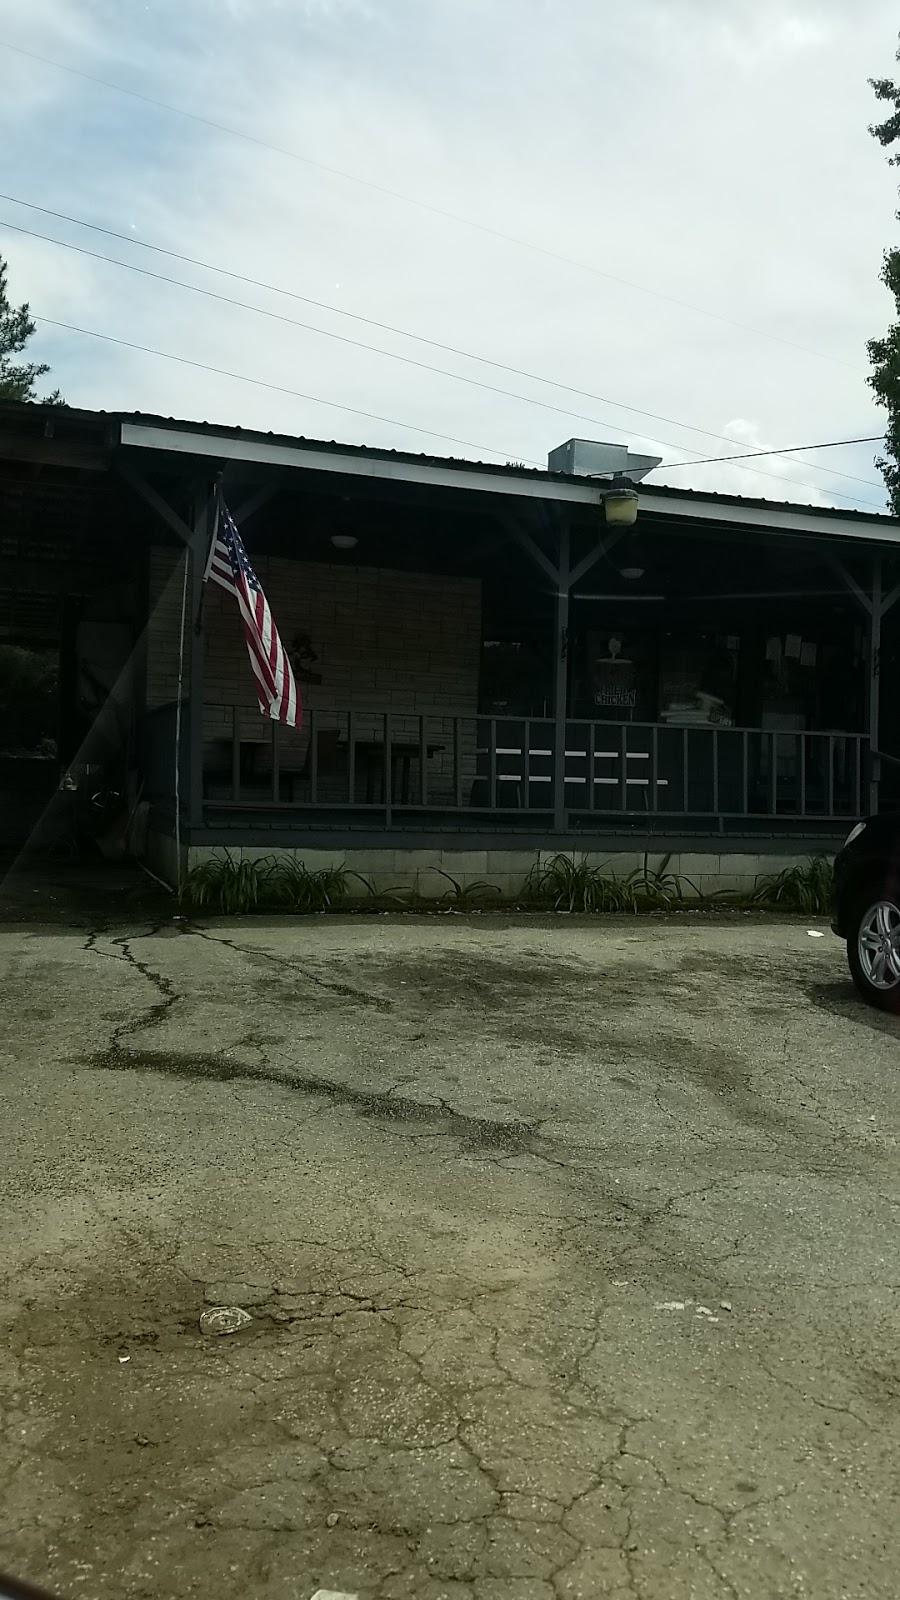 J & Js Fried Chicken & Seafood   meal takeaway   1311 E Screven St, Quitman, GA 31643, USA   2292637907 OR +1 229-263-7907